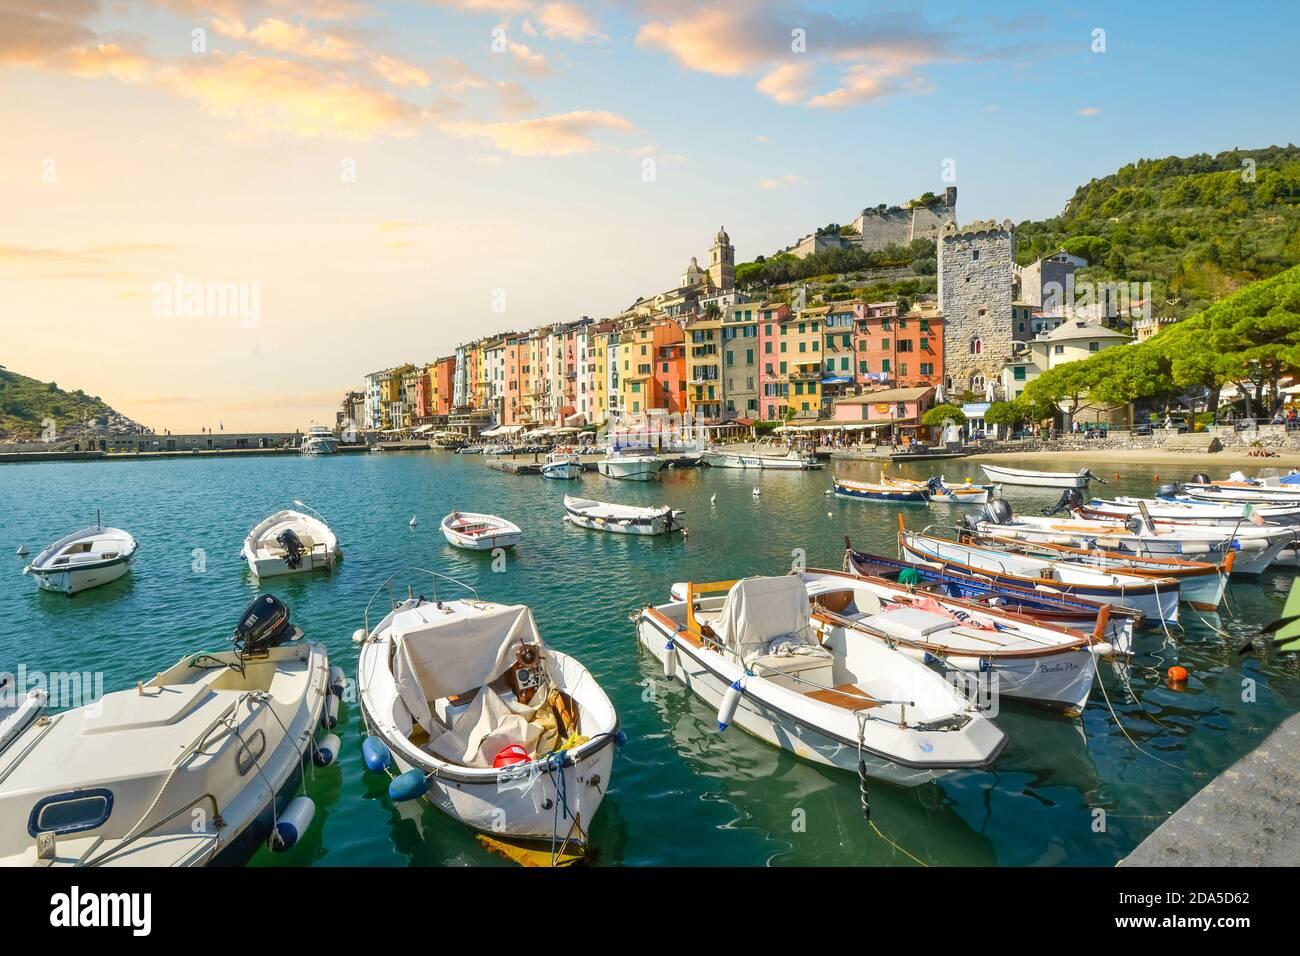 Boats line the harbor of the colorful, touristic Italian city of Portovenere, along the Ligurian Coast of the Italian Riviera. Stock Photo